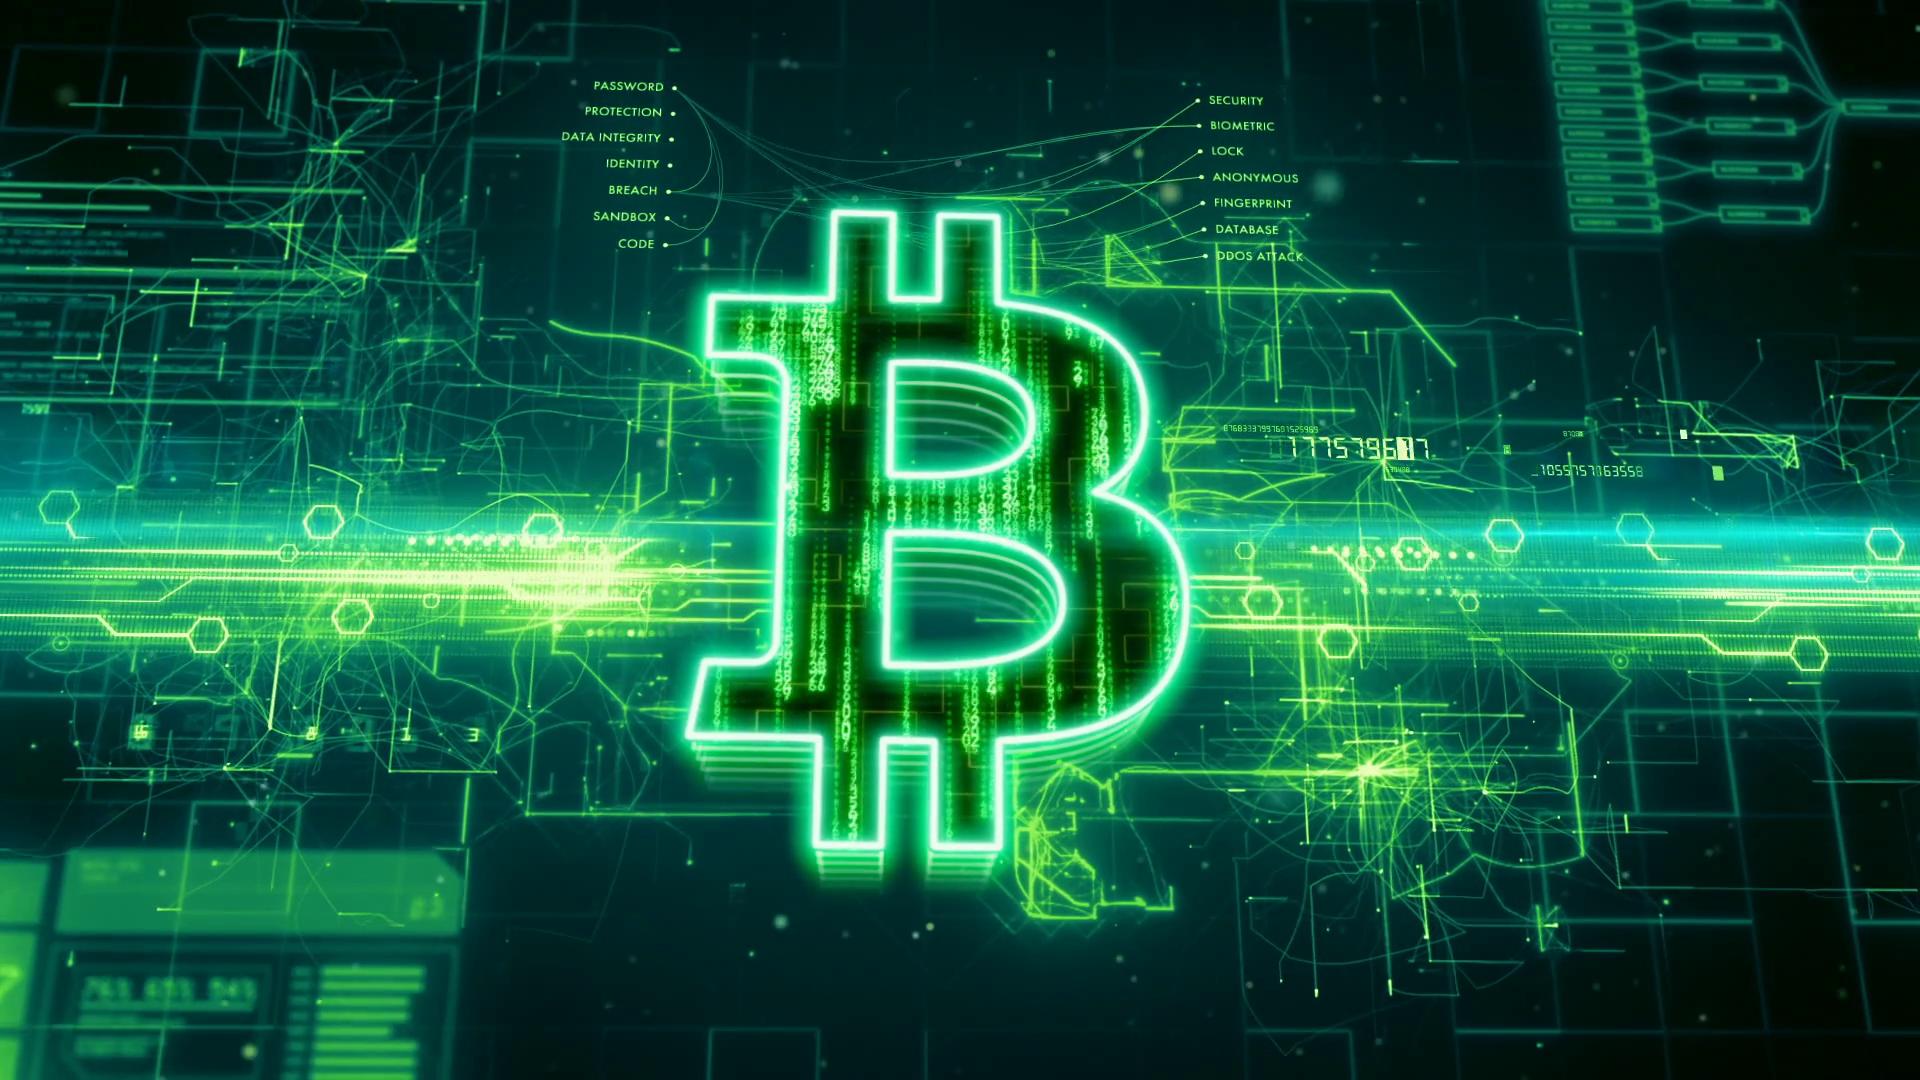 Bitcoin Cash Wallpapers   Top Bitcoin Cash Backgrounds 1920x1080